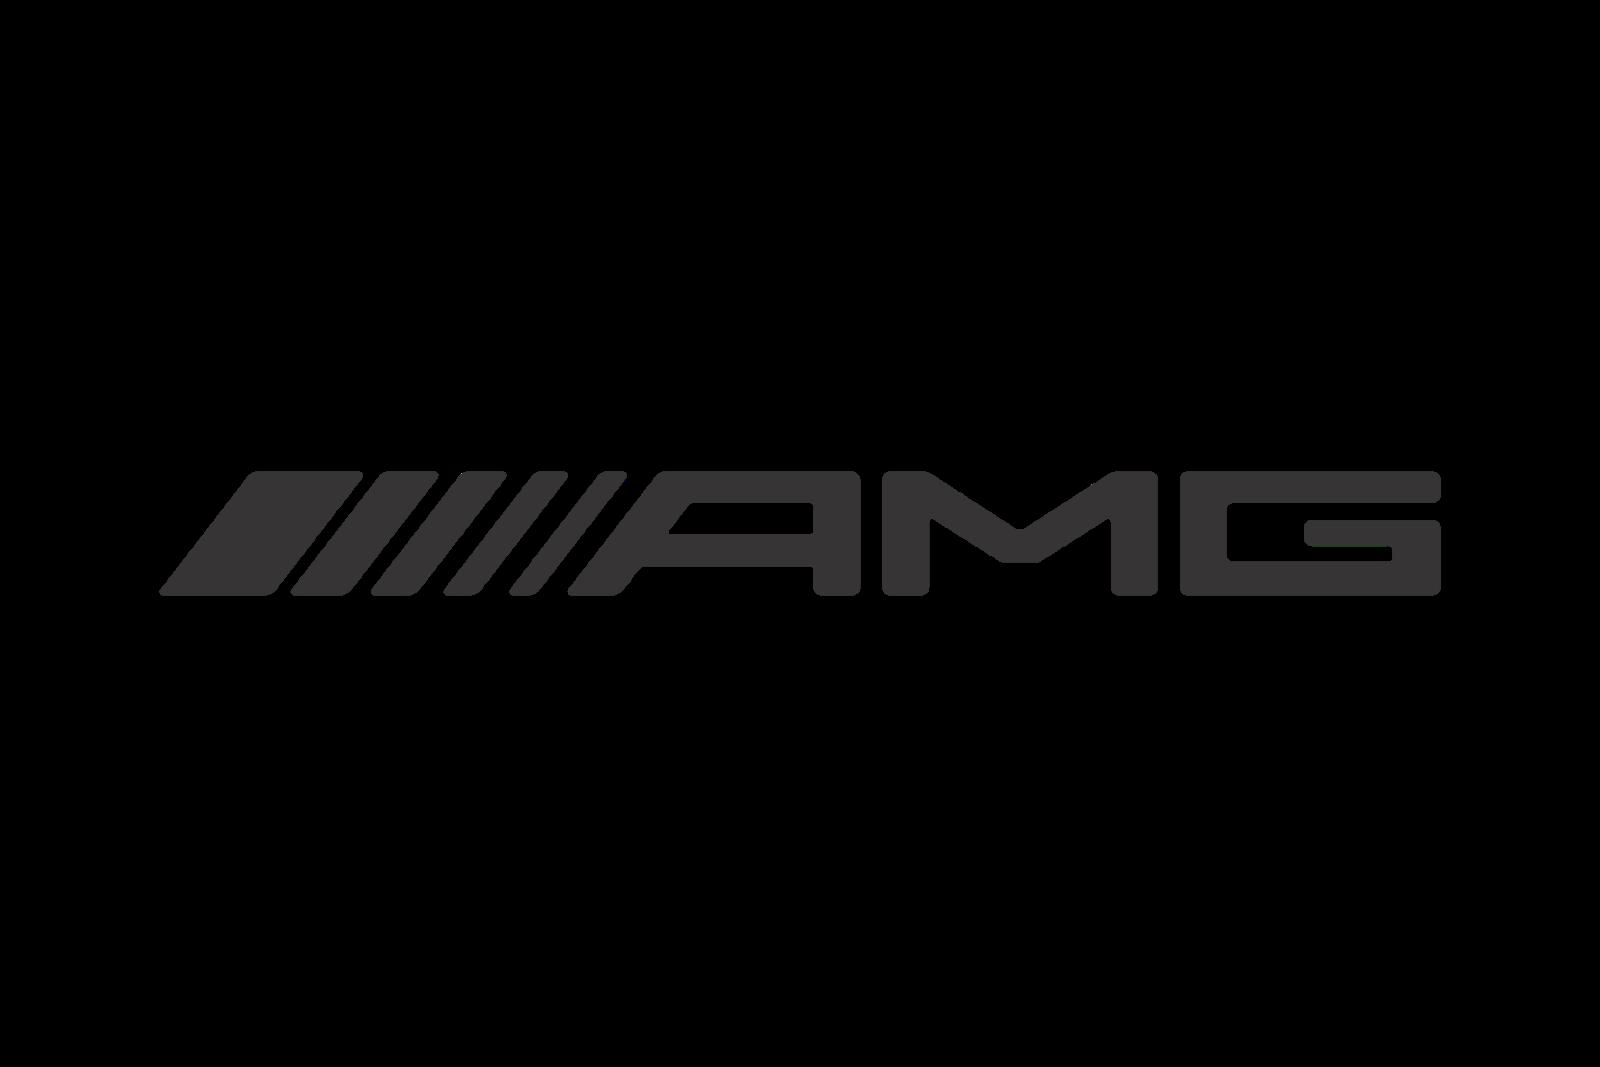 Mercedes Amg Logo Logo Share